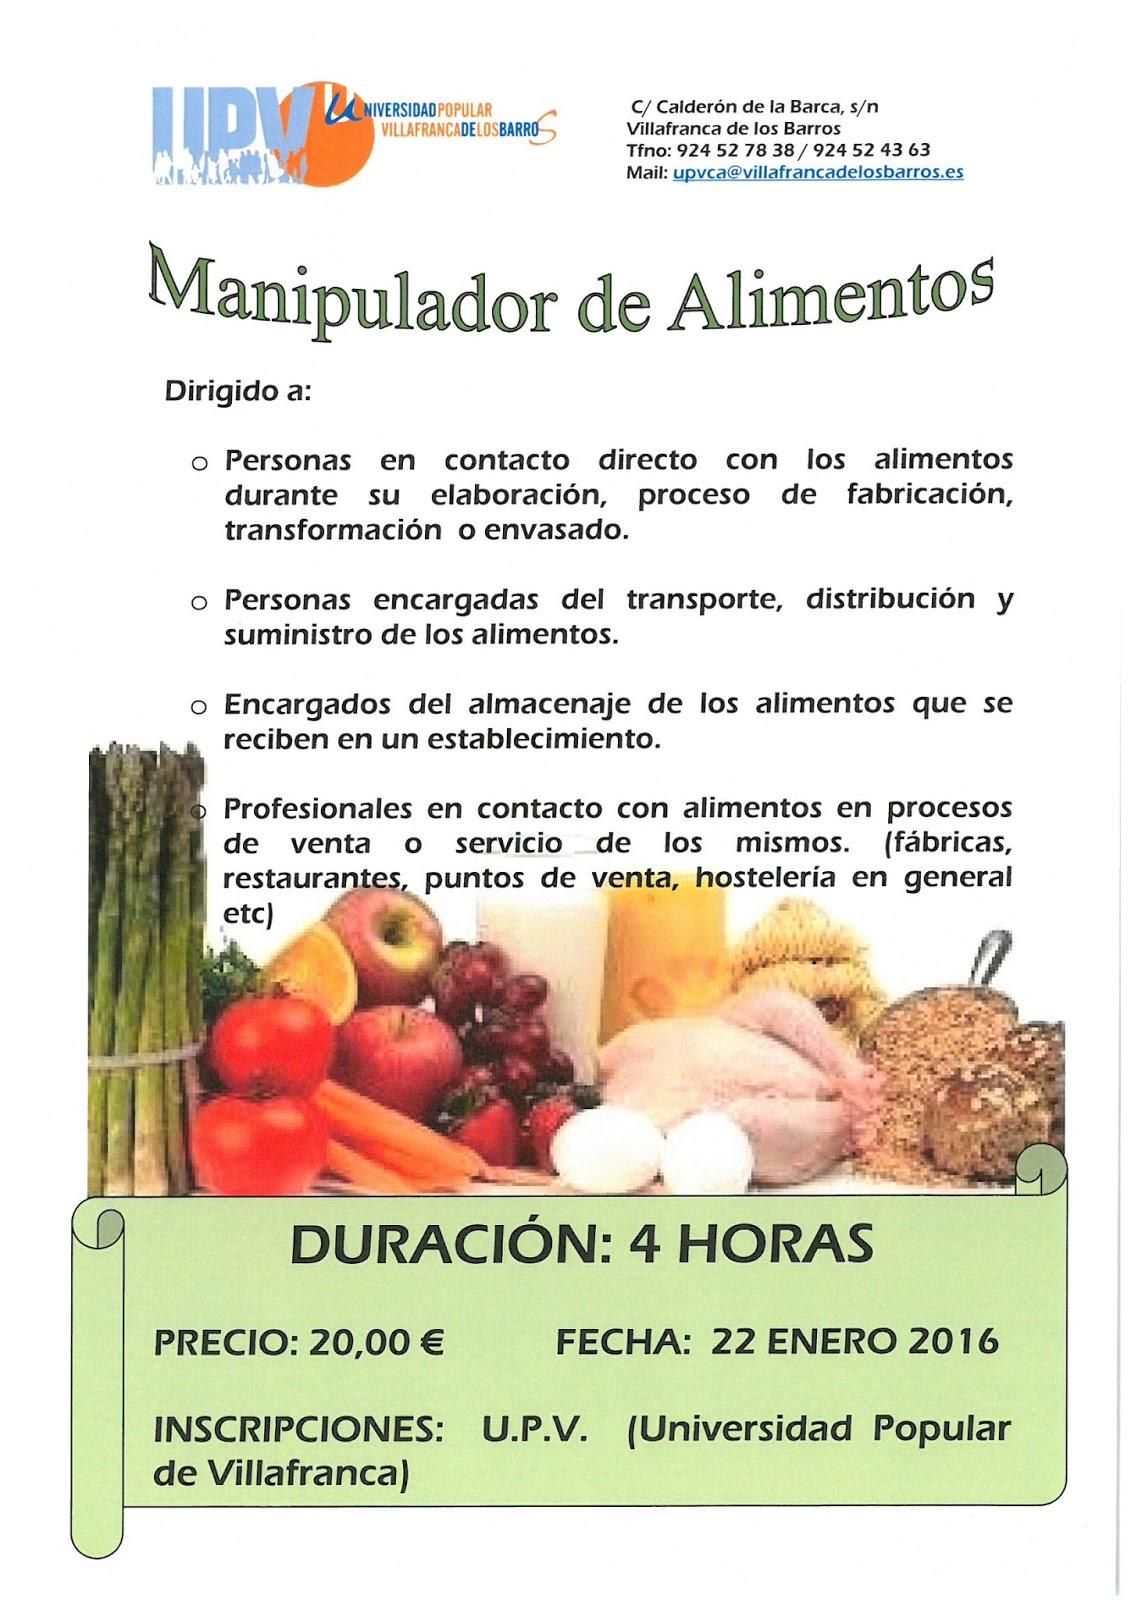 La upv oferta un curso de manipulador de alimentos el eco de los barros - Www manipulador de alimentos es ...